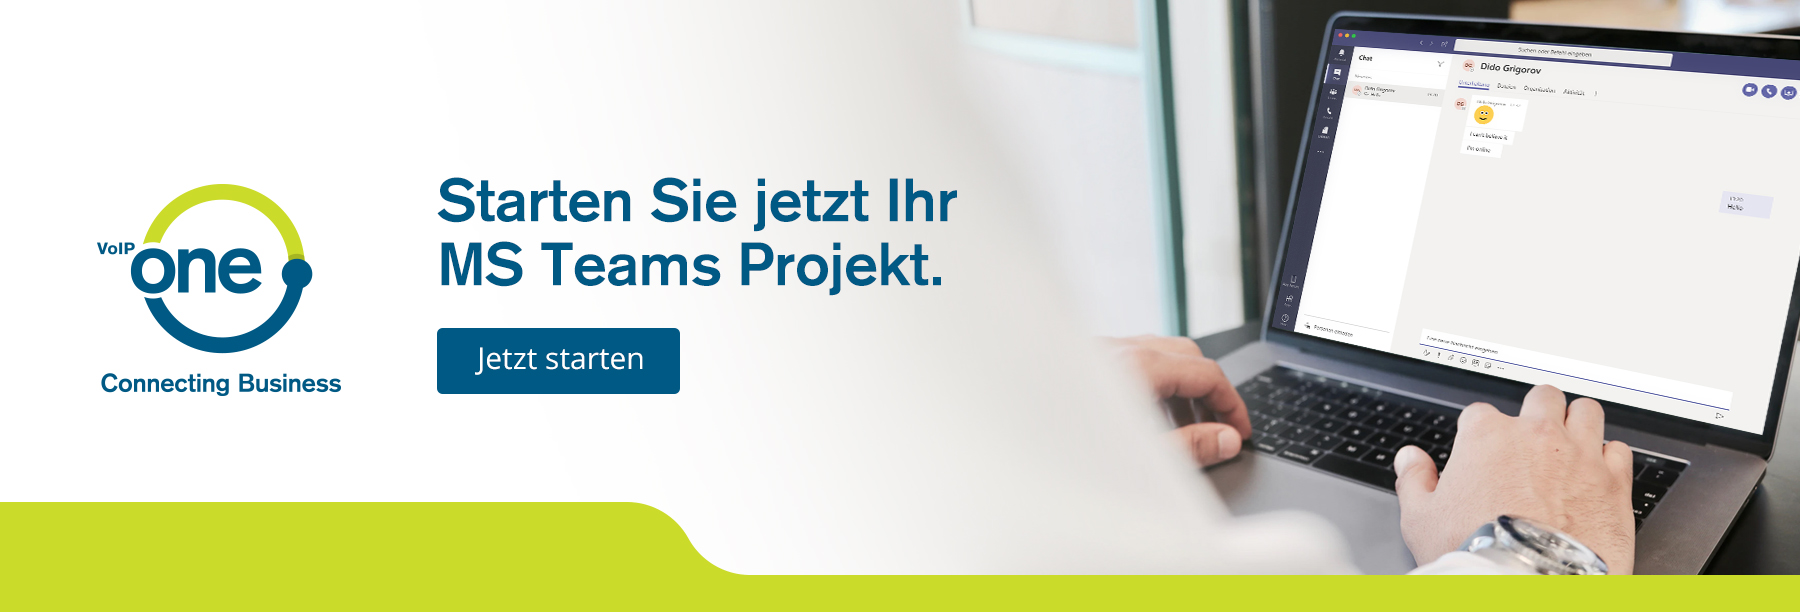 Microsoft Teams - Jetzt starten